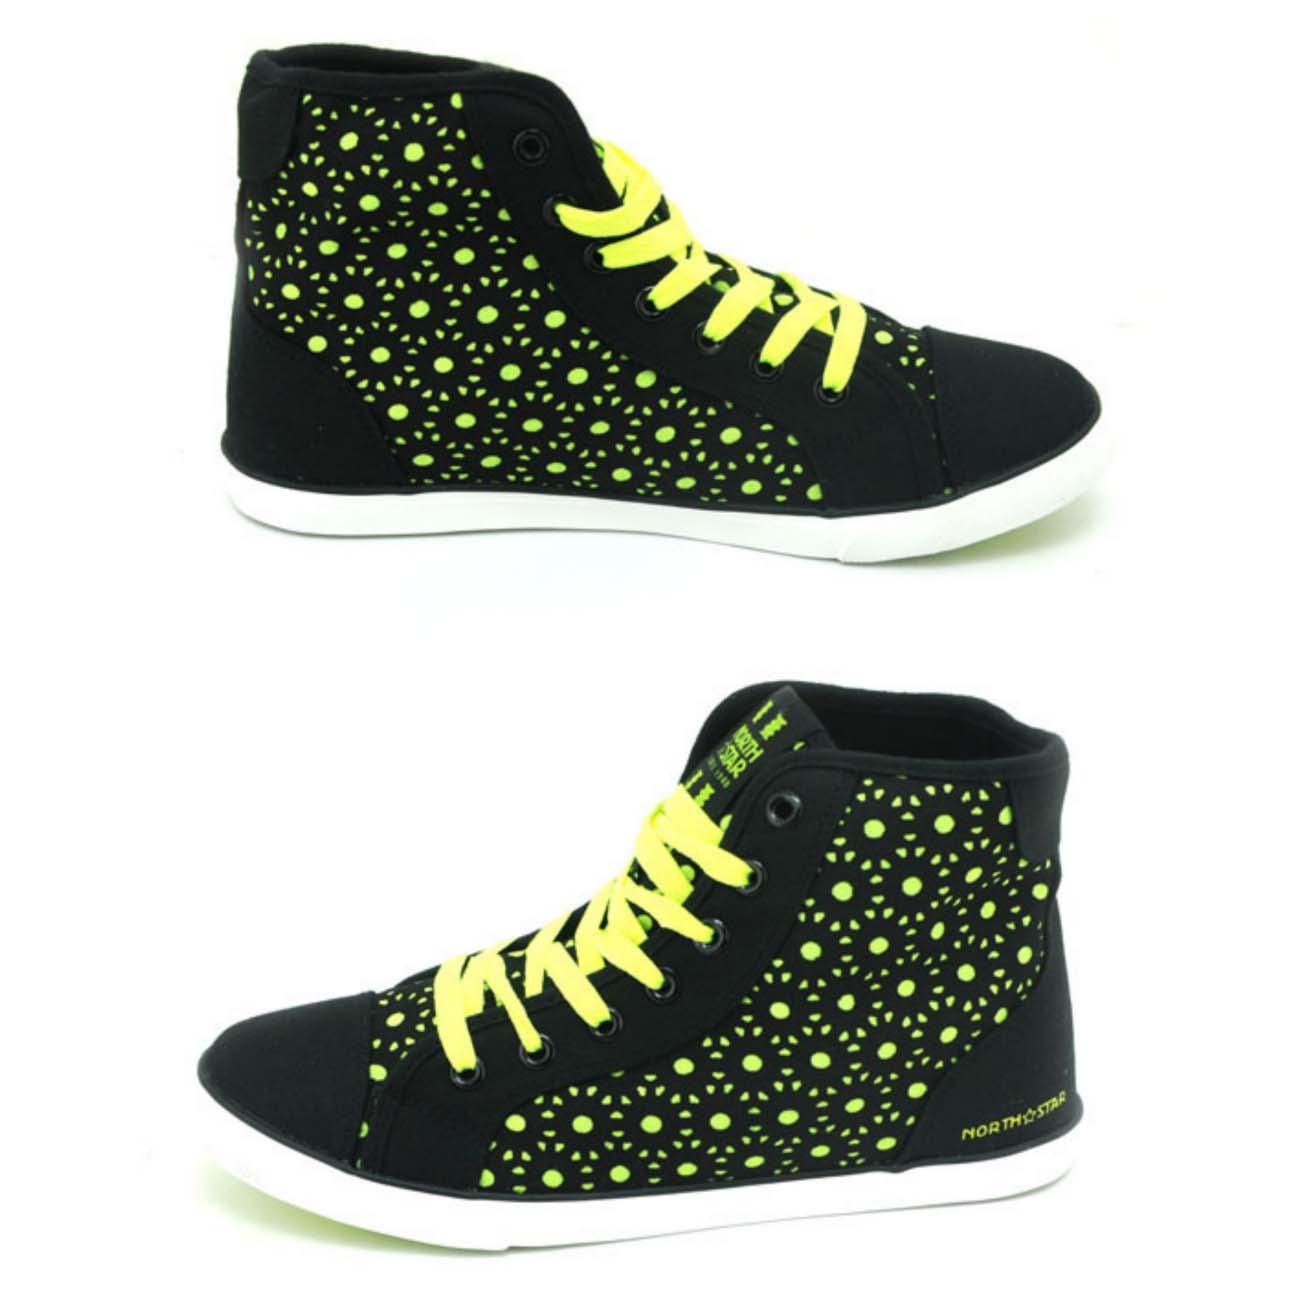 Girls In Globe Shoes